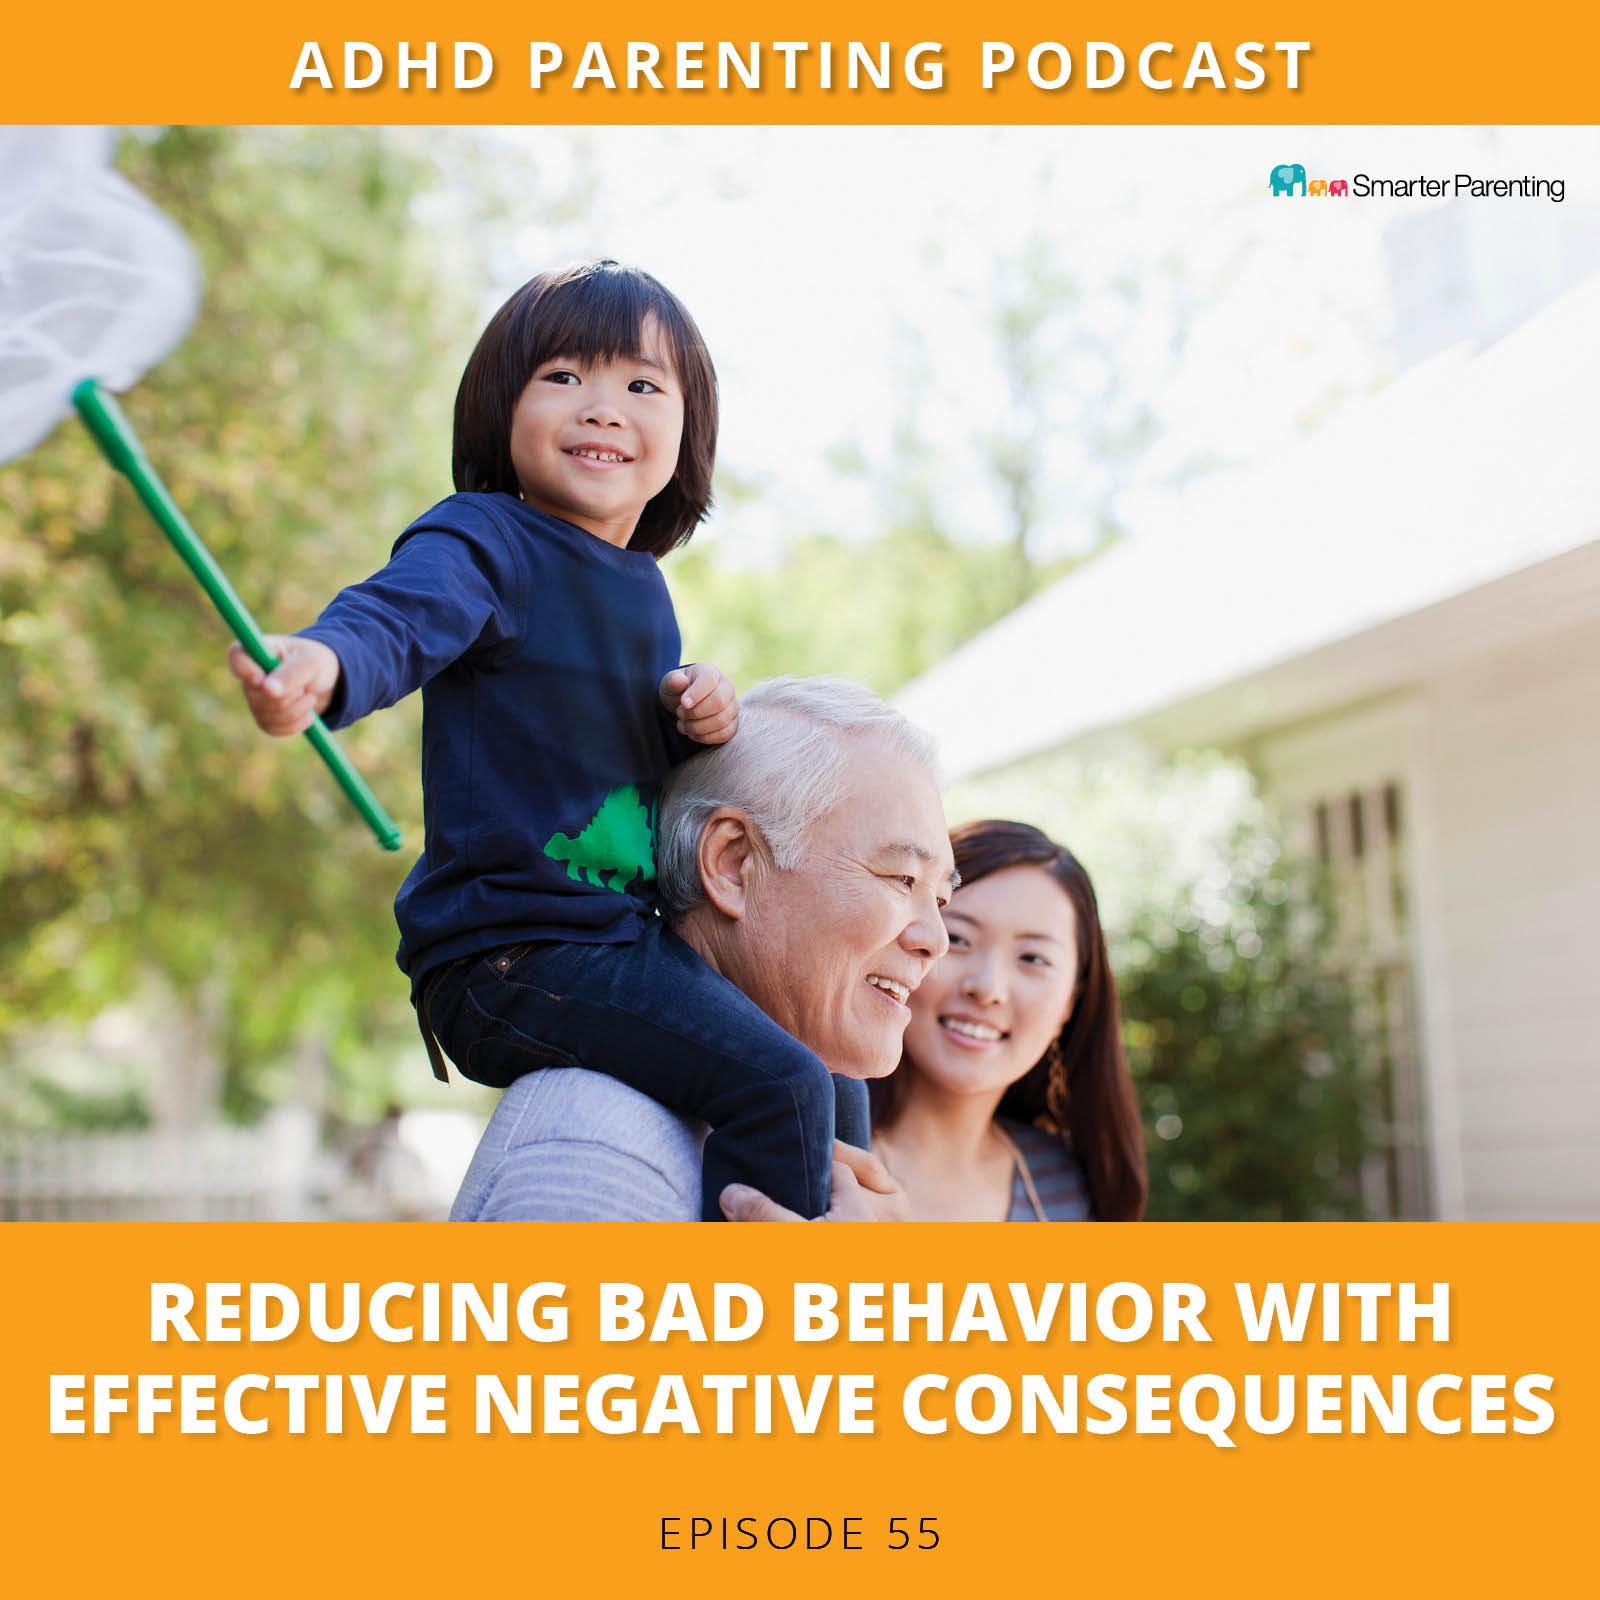 Ep 55 Reducing Bad Behavior With Effective Negative